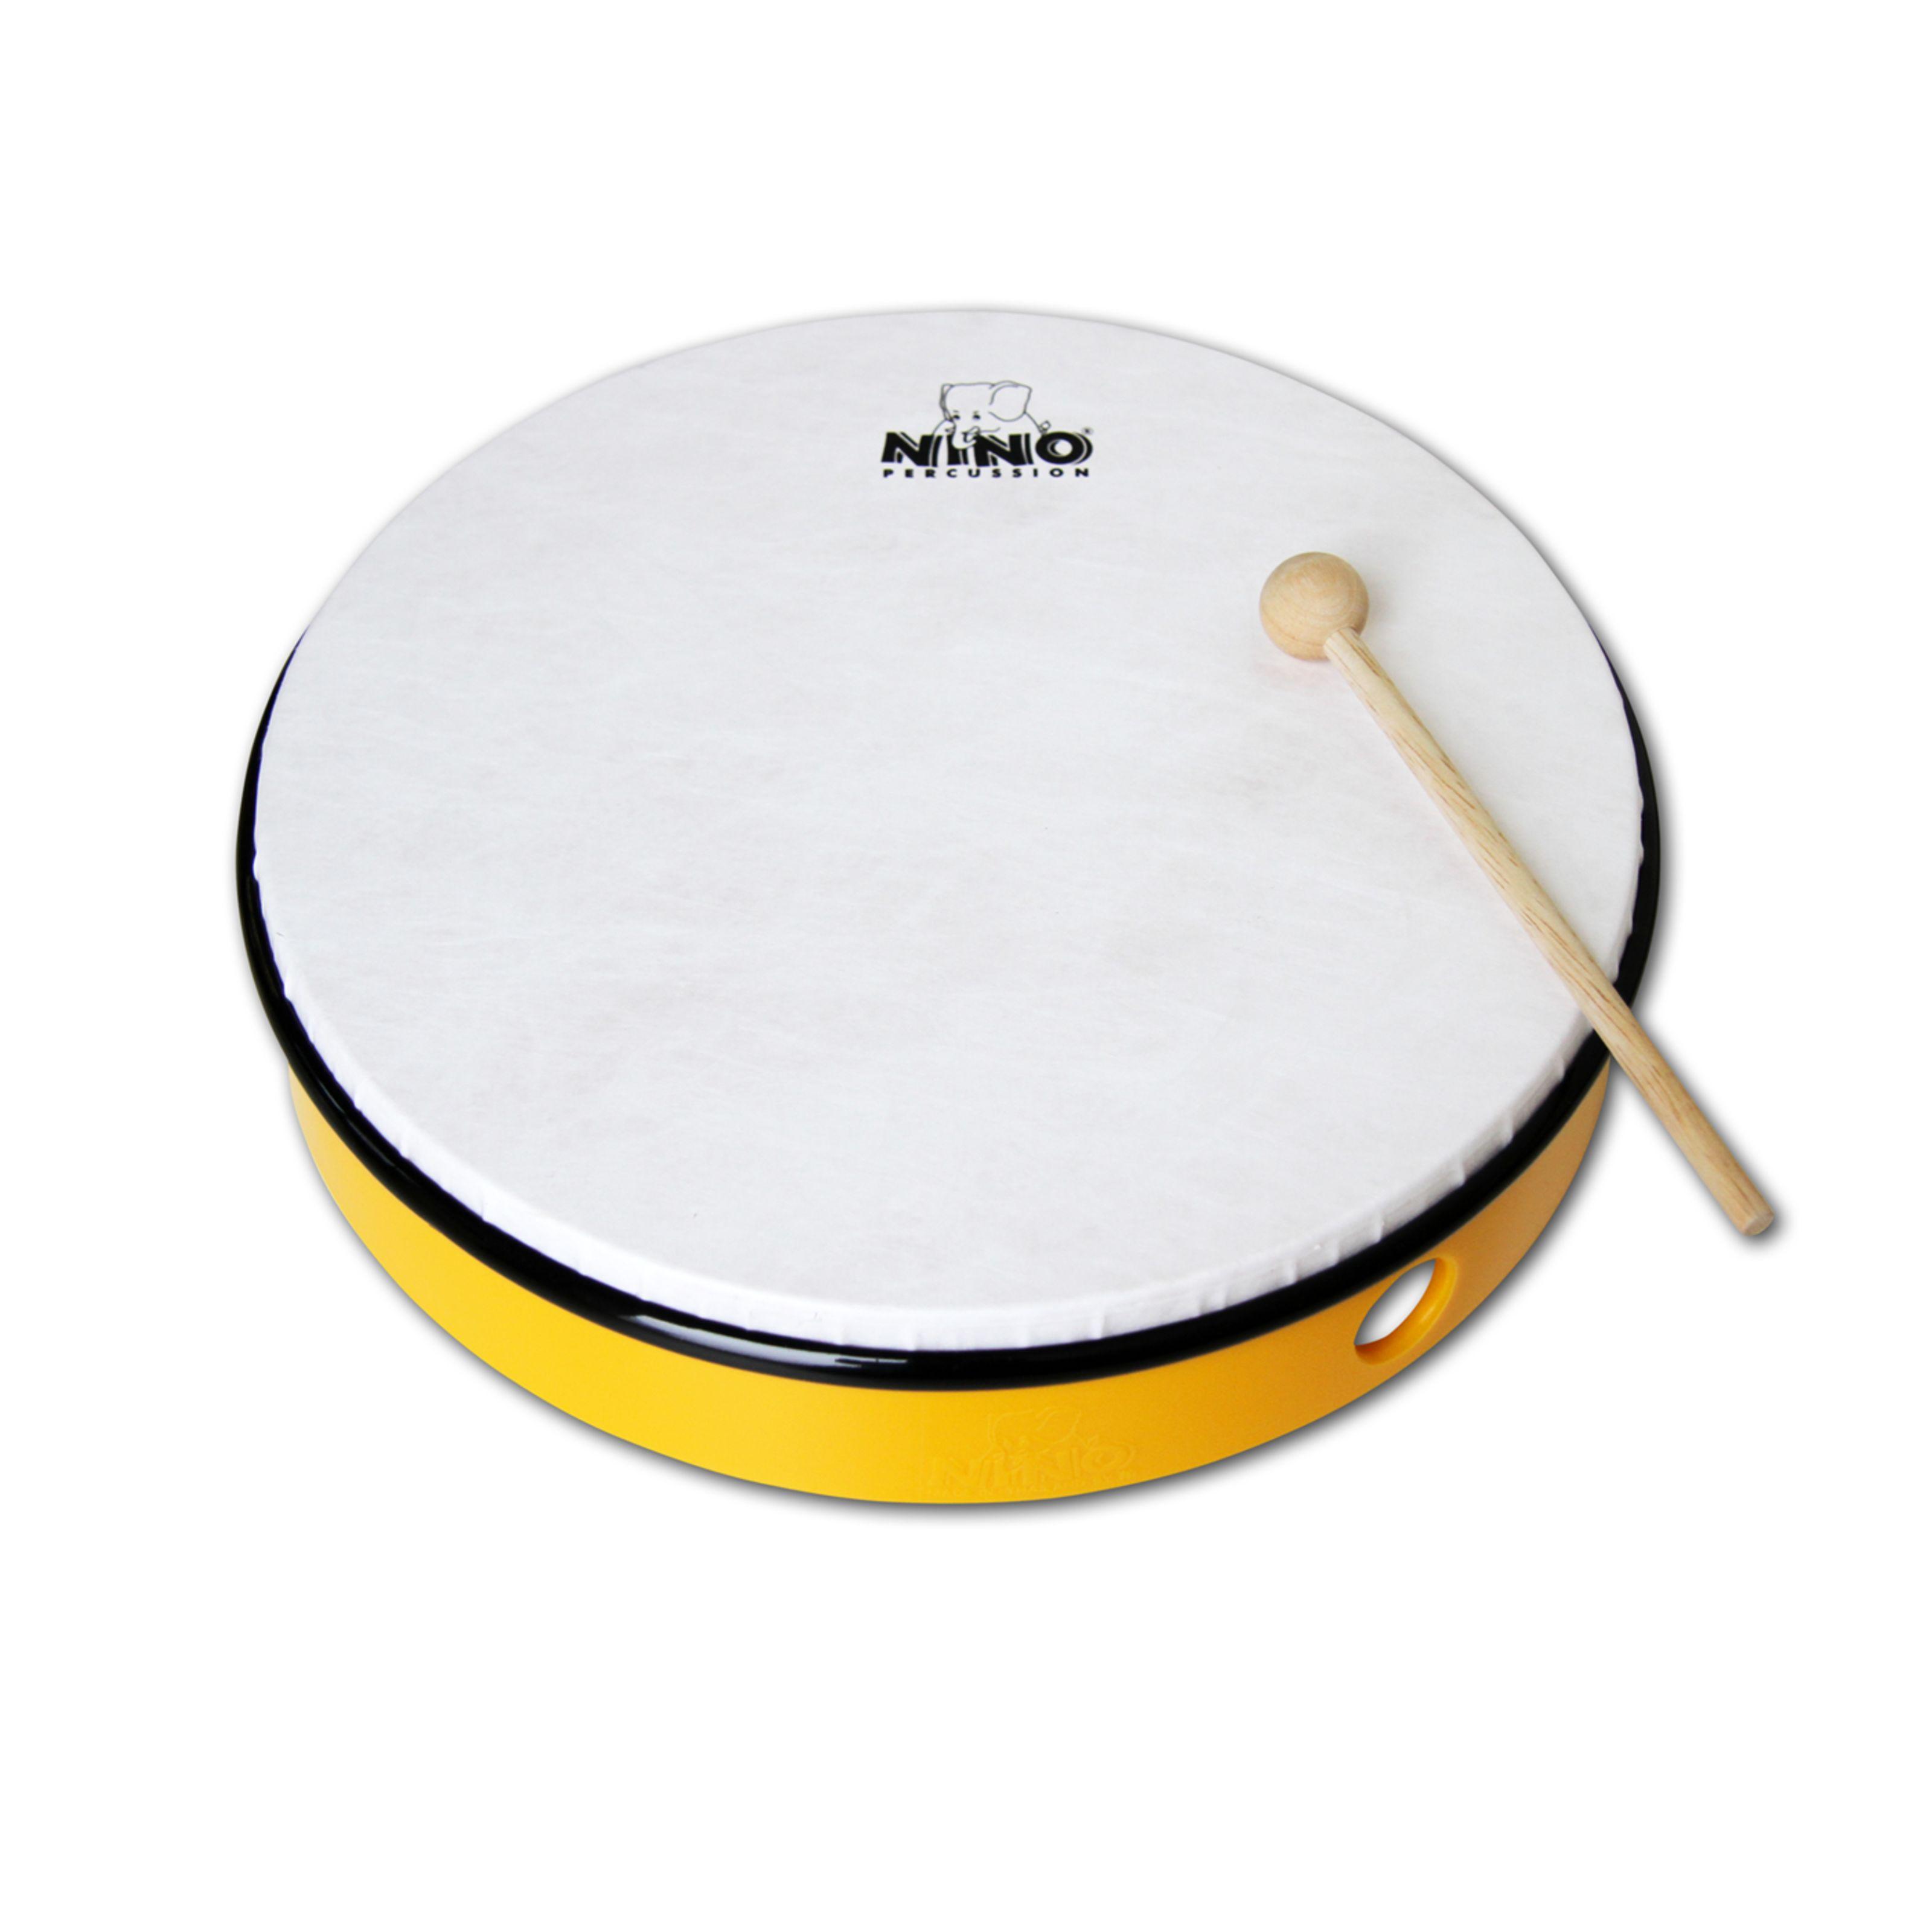 Meinl - HandDrum NINO5Y, 10, Yellow